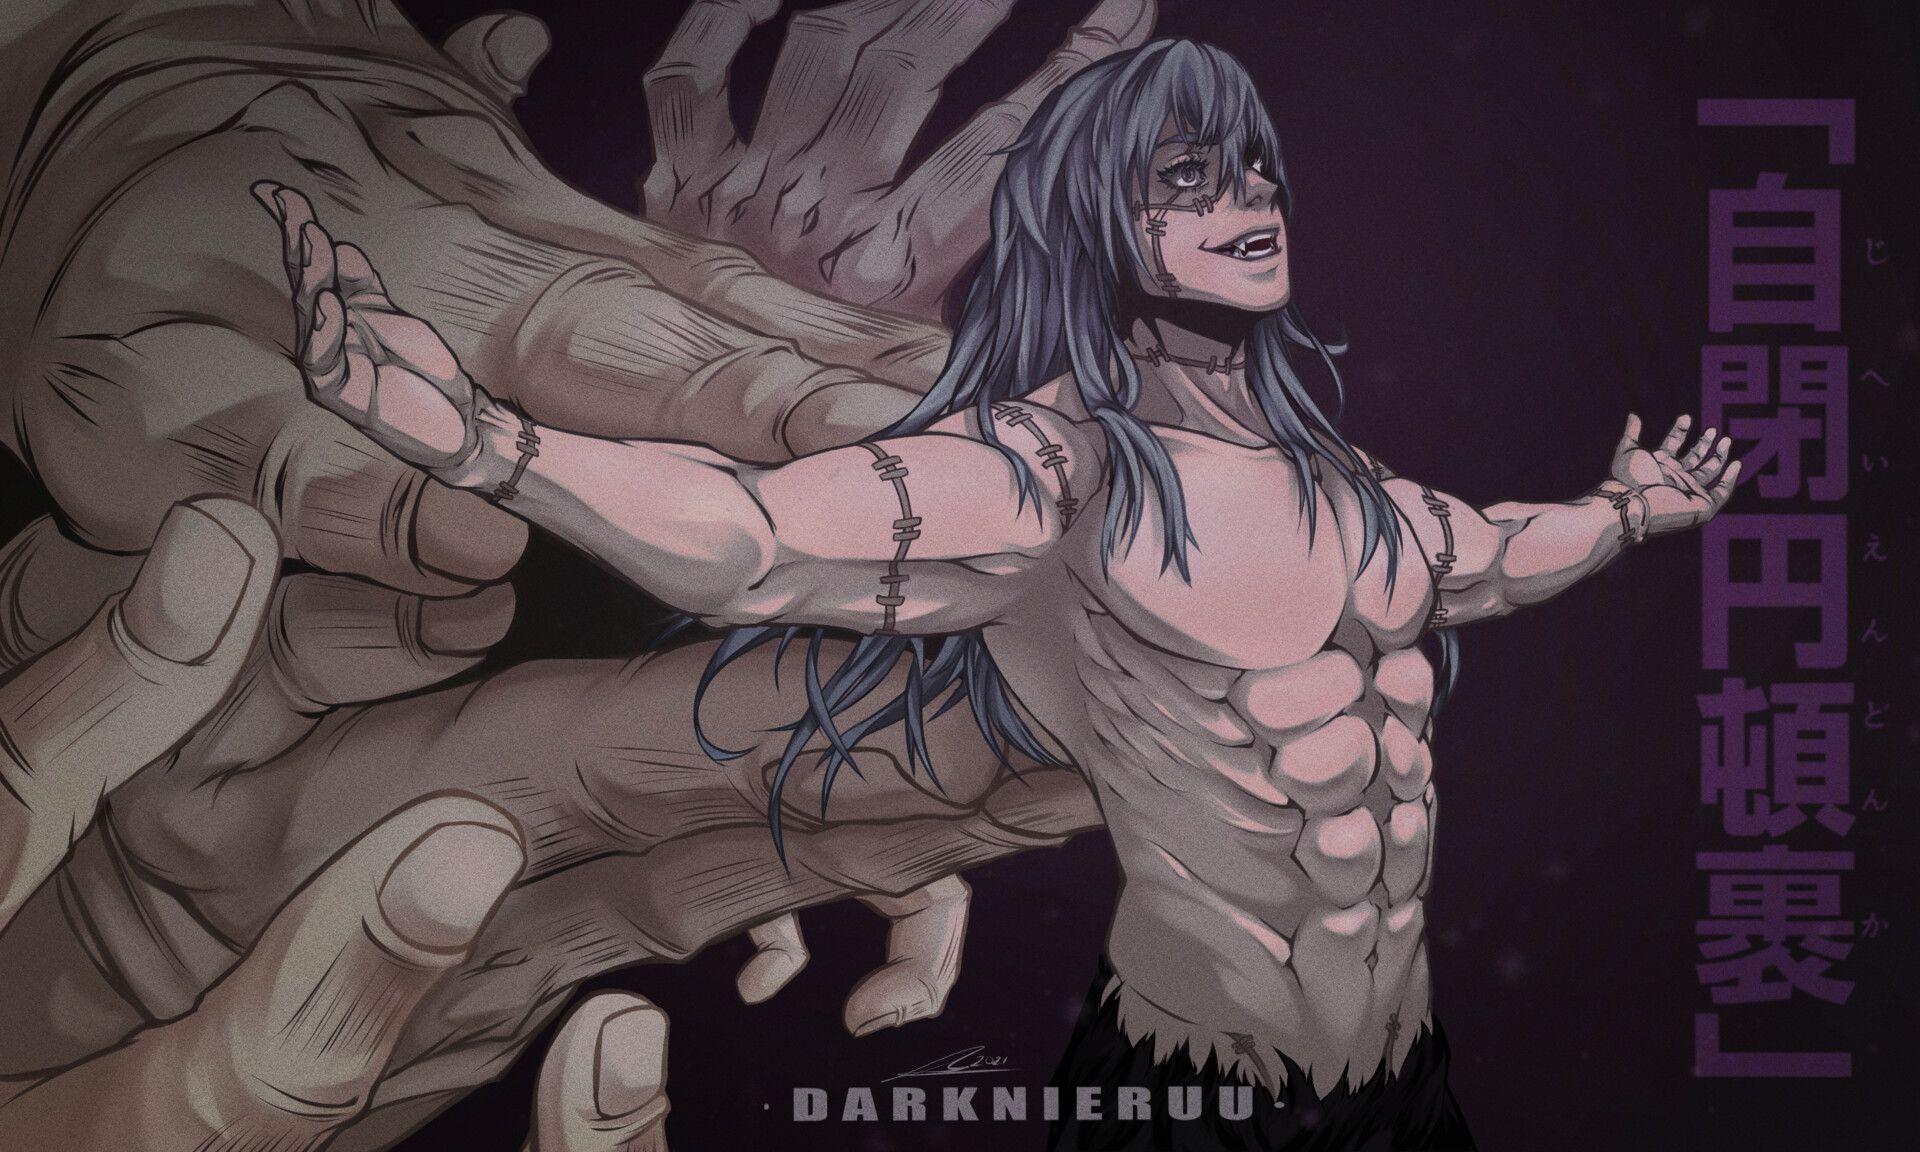 Pin By Lauren Wells On Jujutsu Kaisen In 2021 Anime Fanart Anime Jujutsu